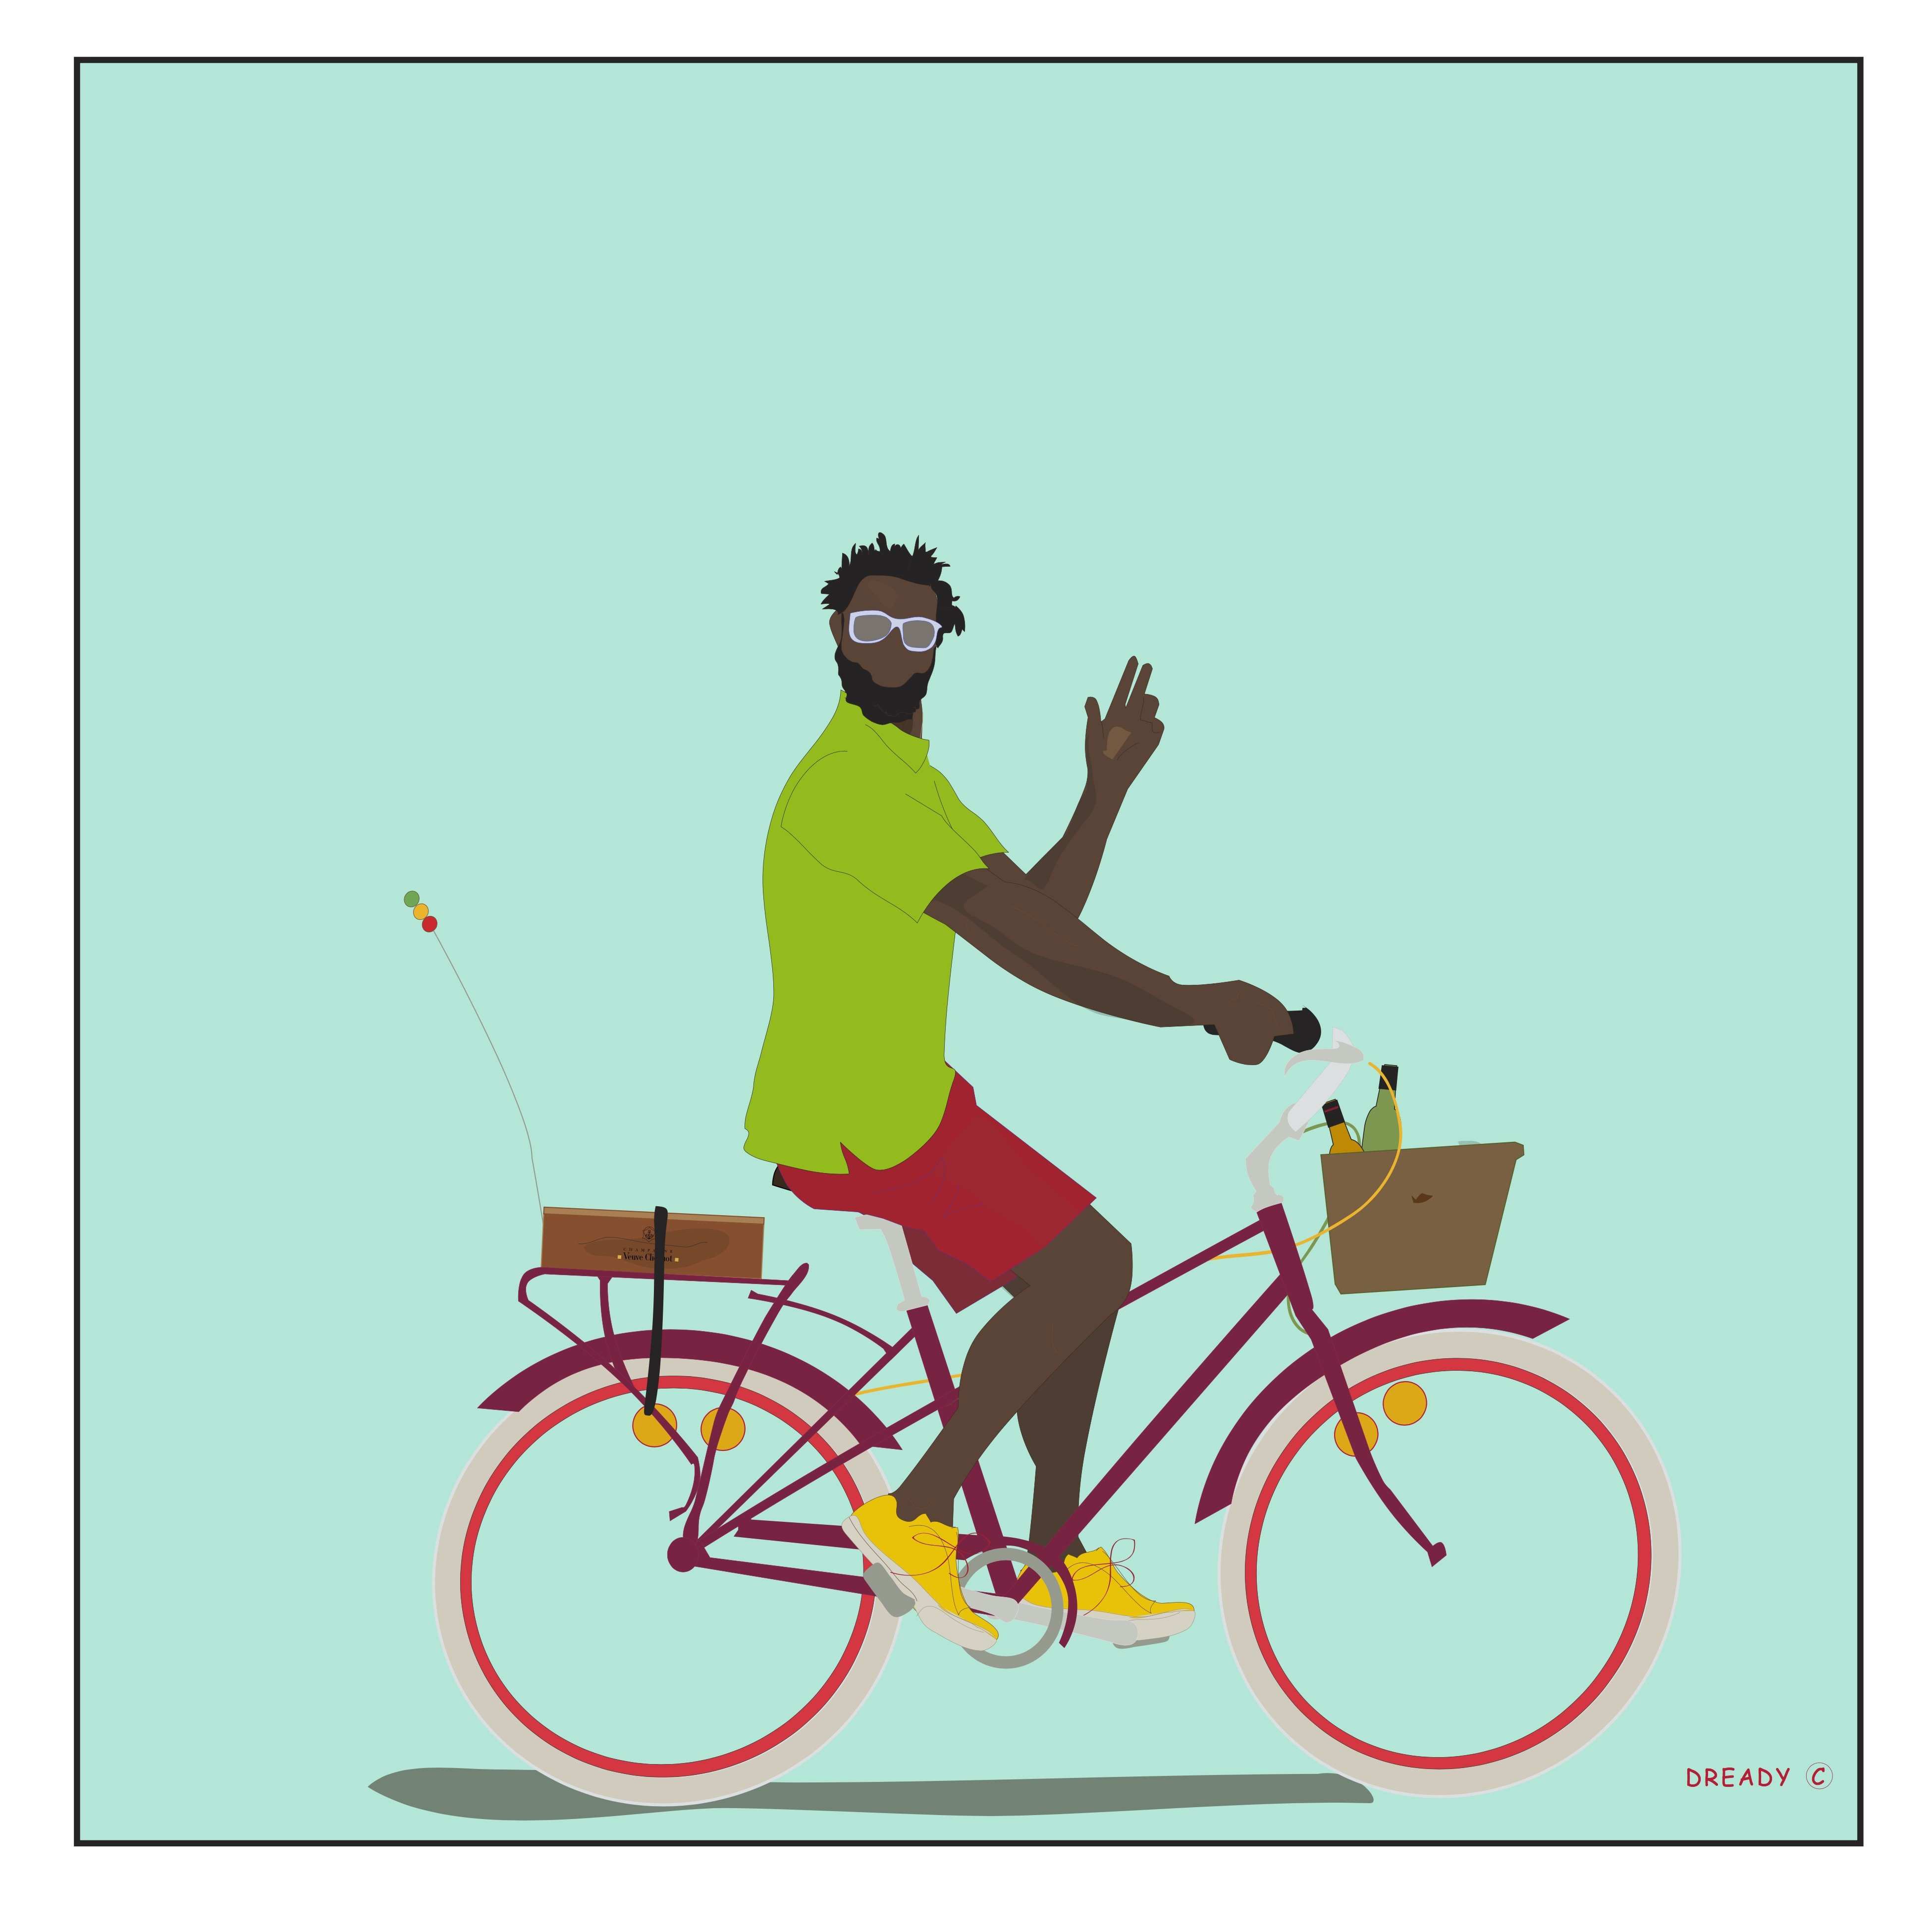 Bredderin Bicyclist